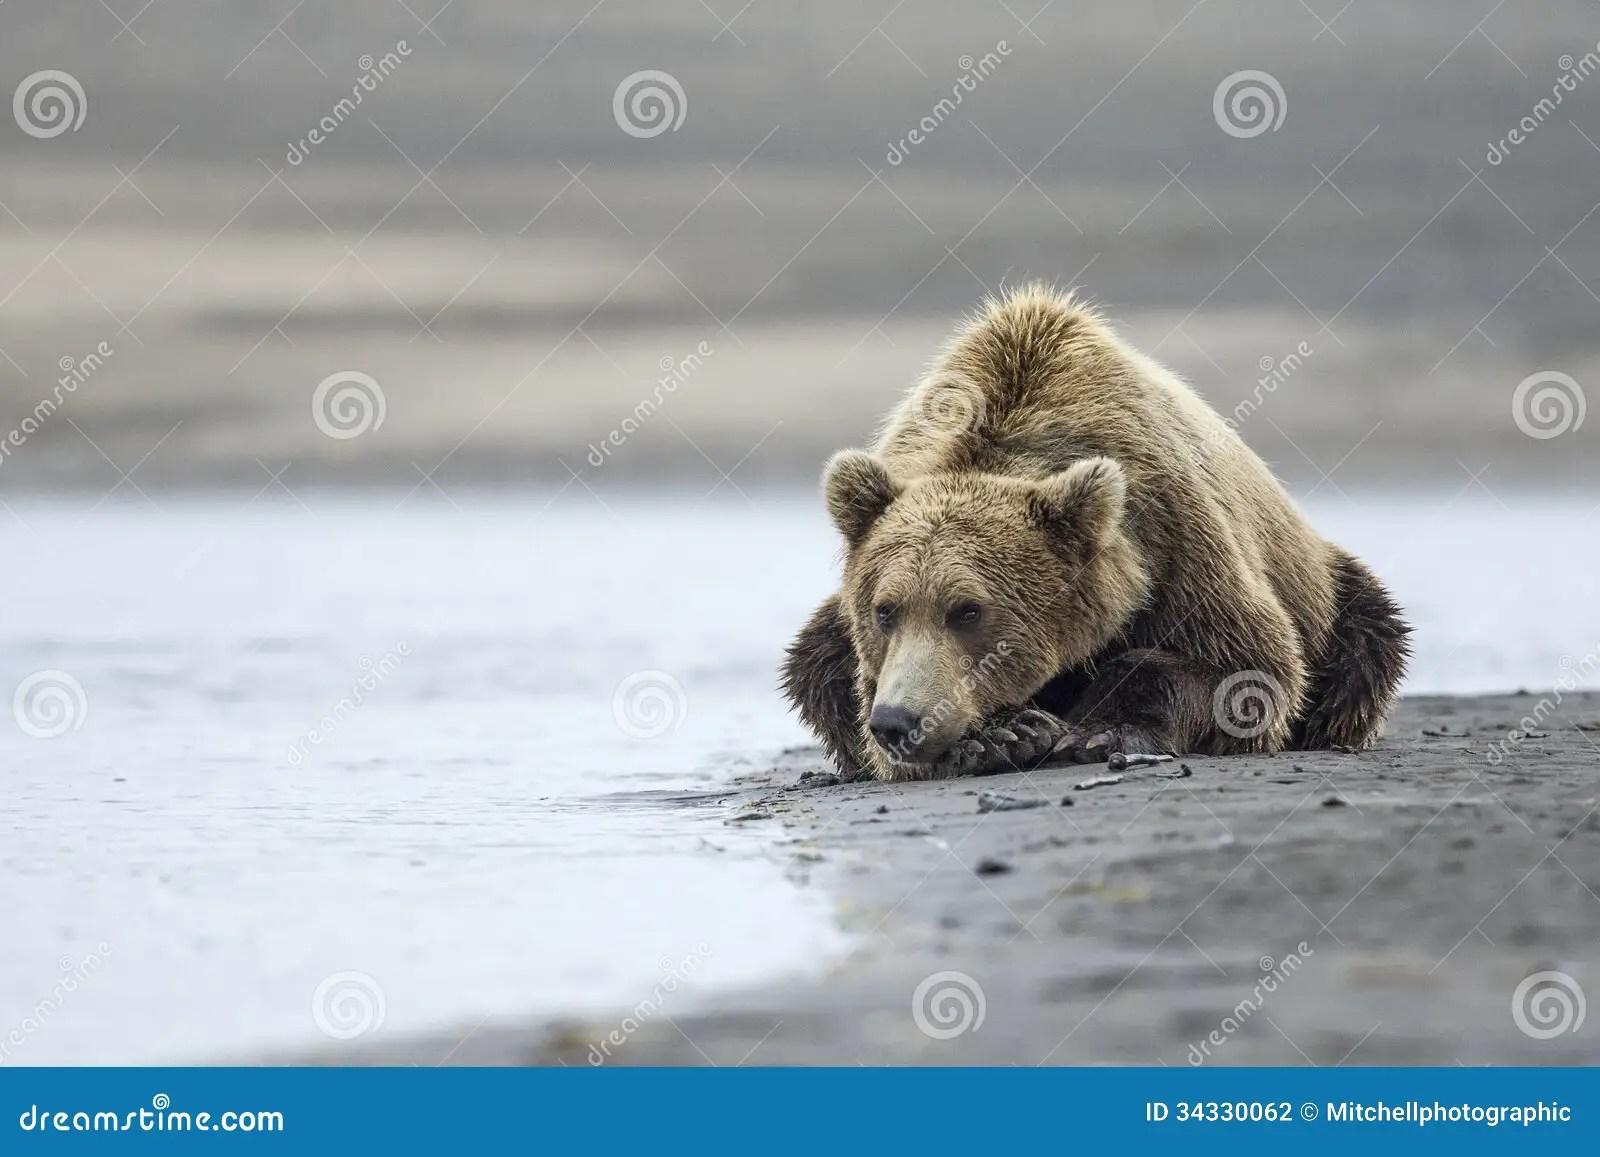 Coastal Brown Bear Stock Photography - Image: 34330062